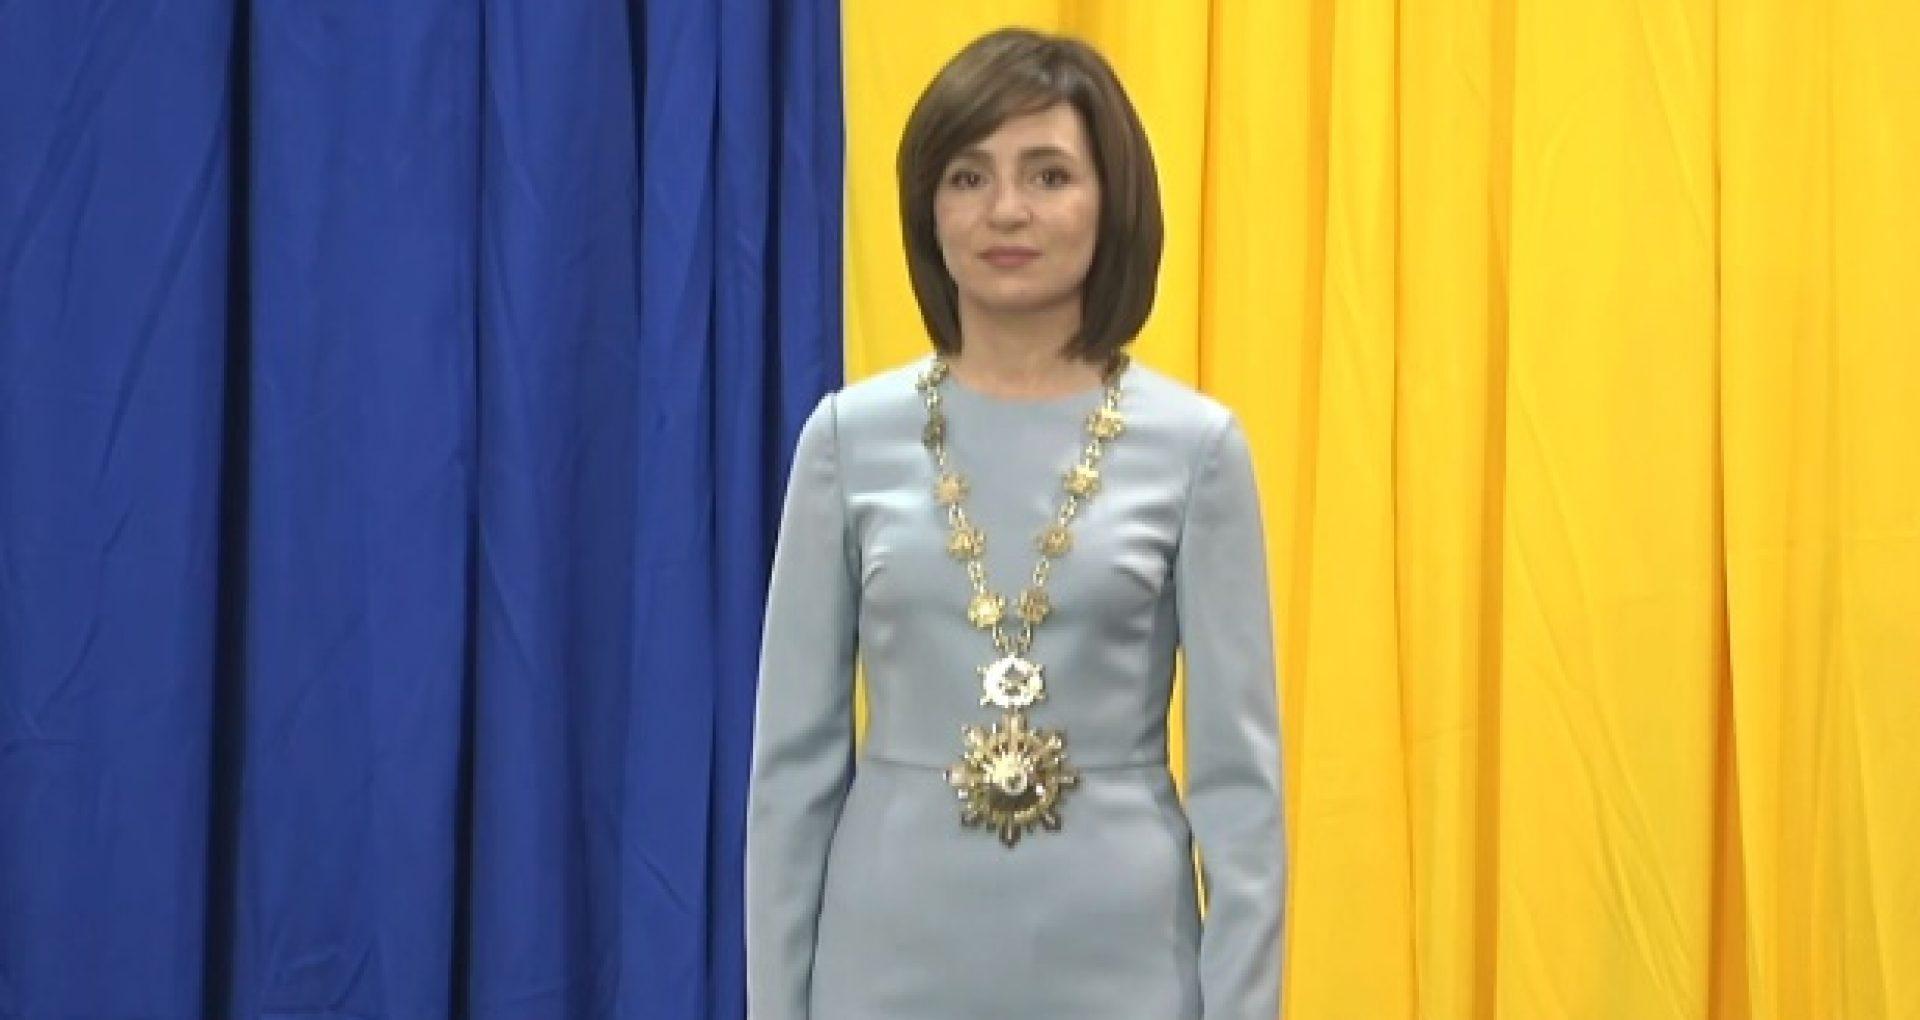 Președinta R. Moldova, Maia Sandu, va invita fracțiunile parlamentare la consultări